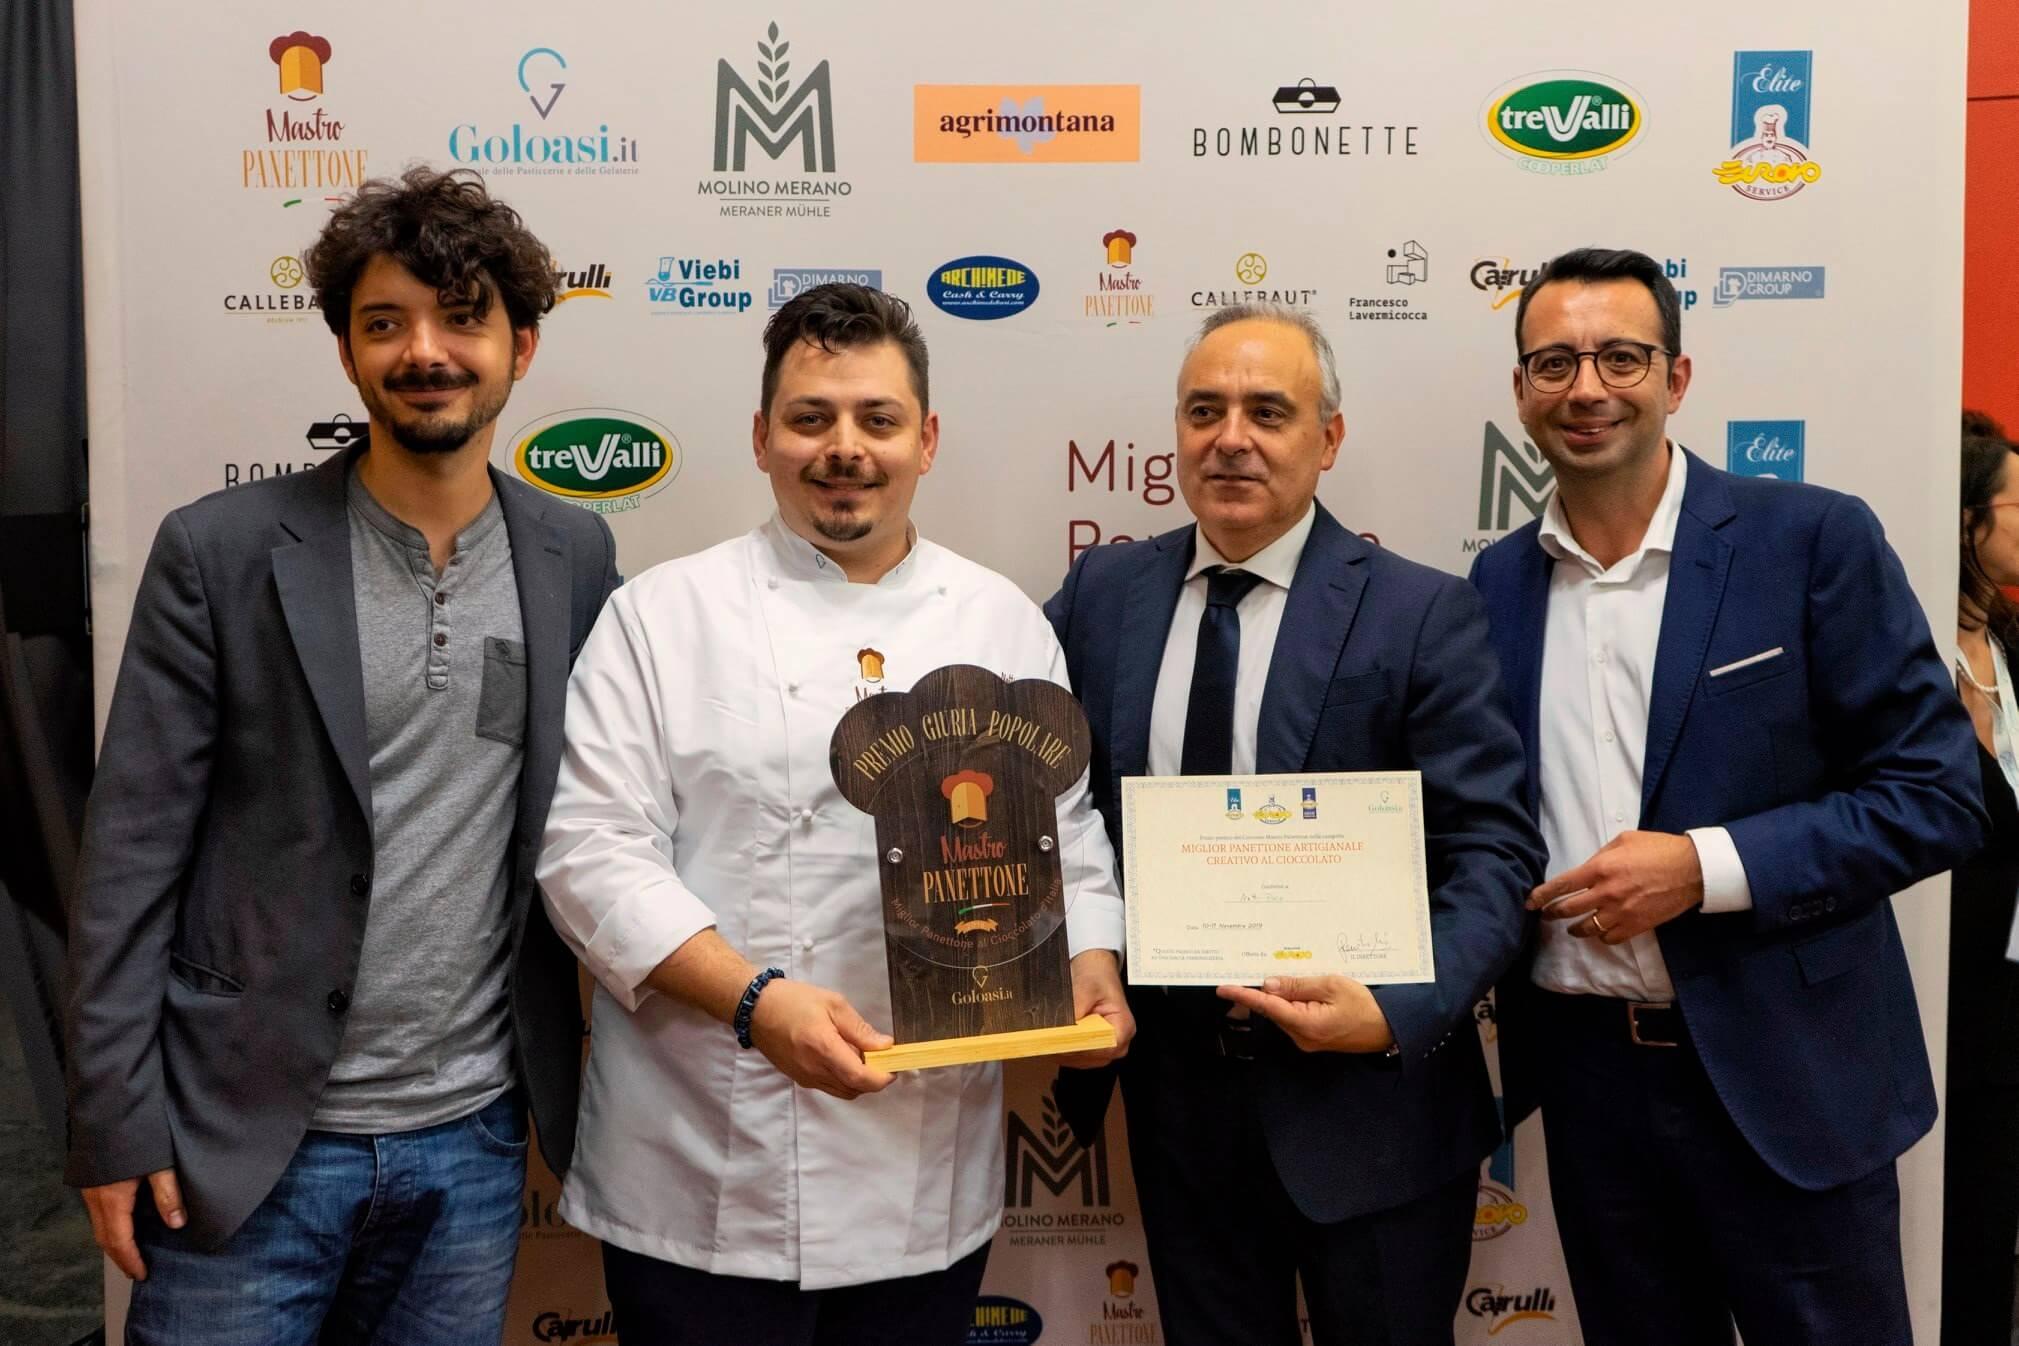 Mastro Panettone 2019 - Goloasi - Dolceria Sapone - Eustachio Sapone 1